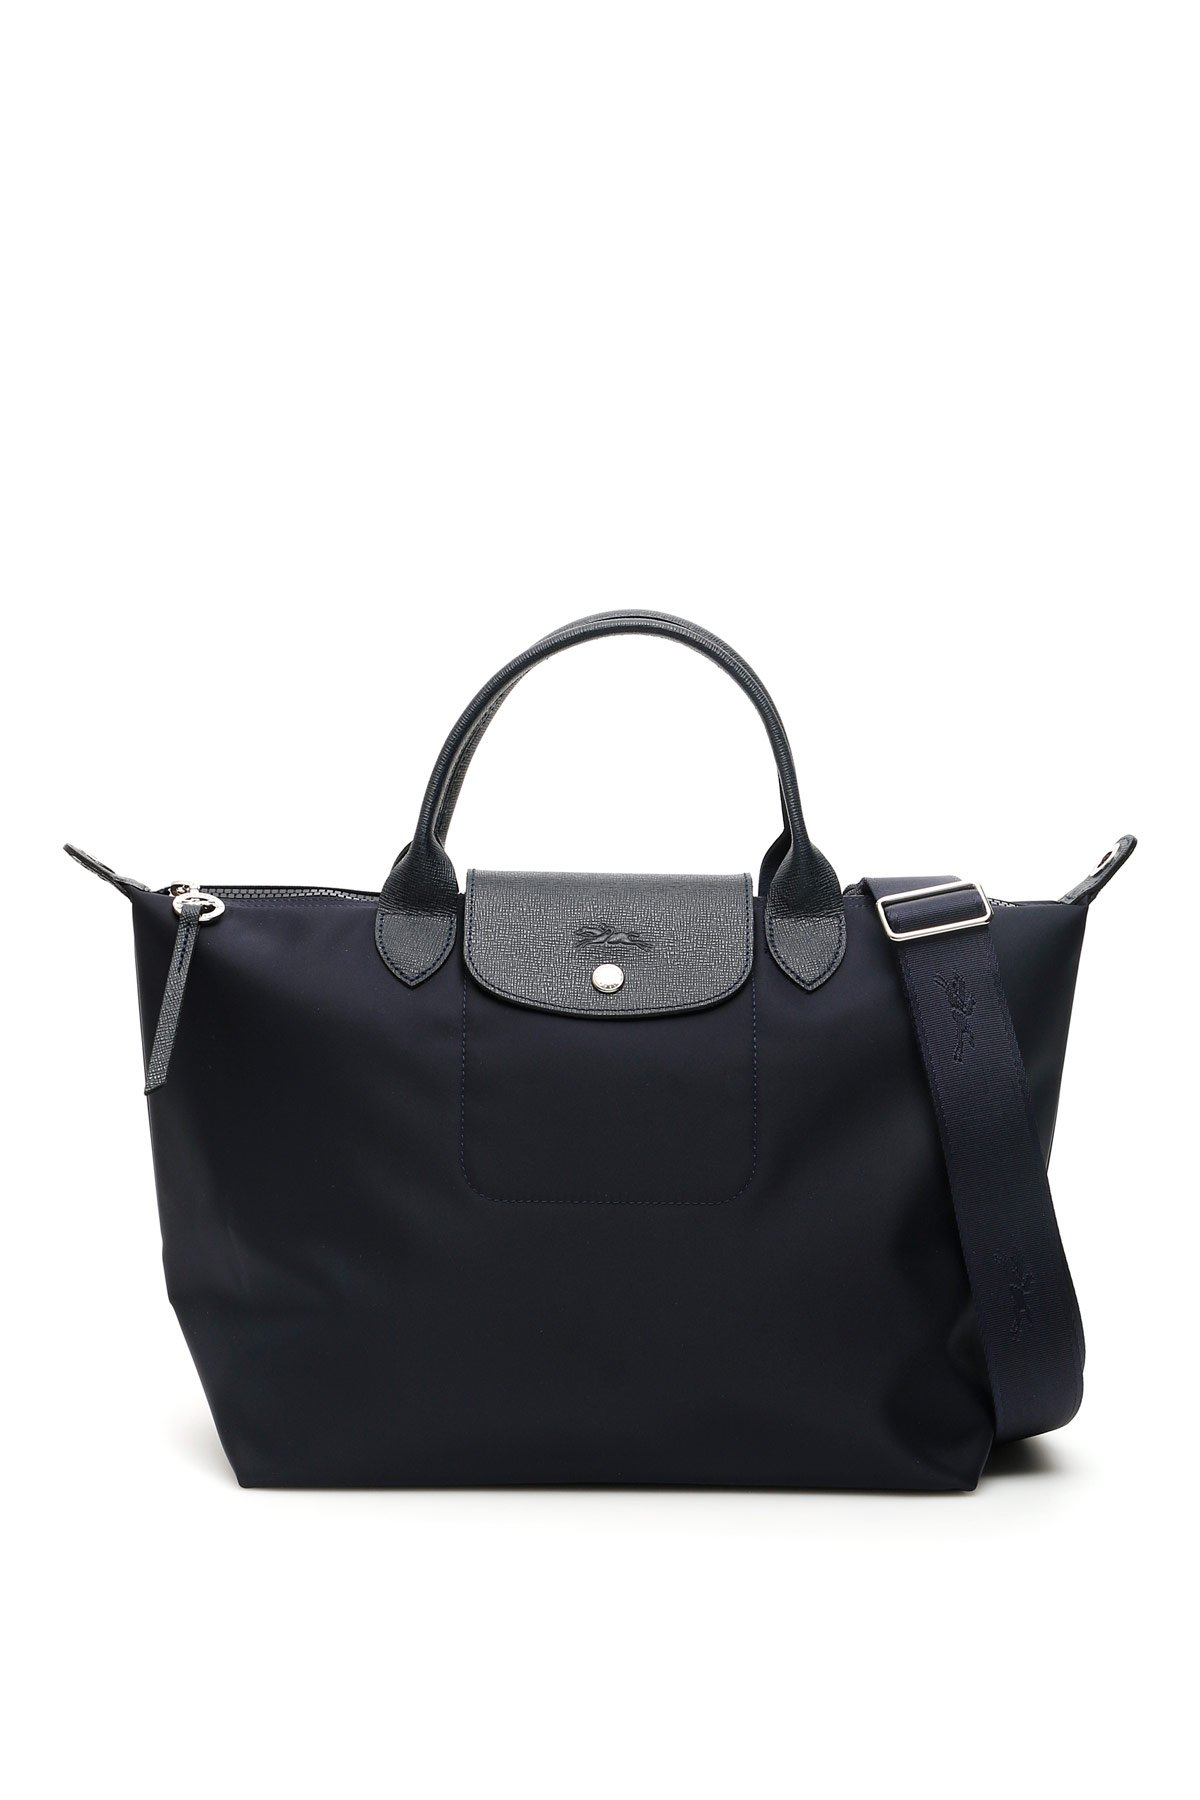 Longchamp shopping le pliage néo medium